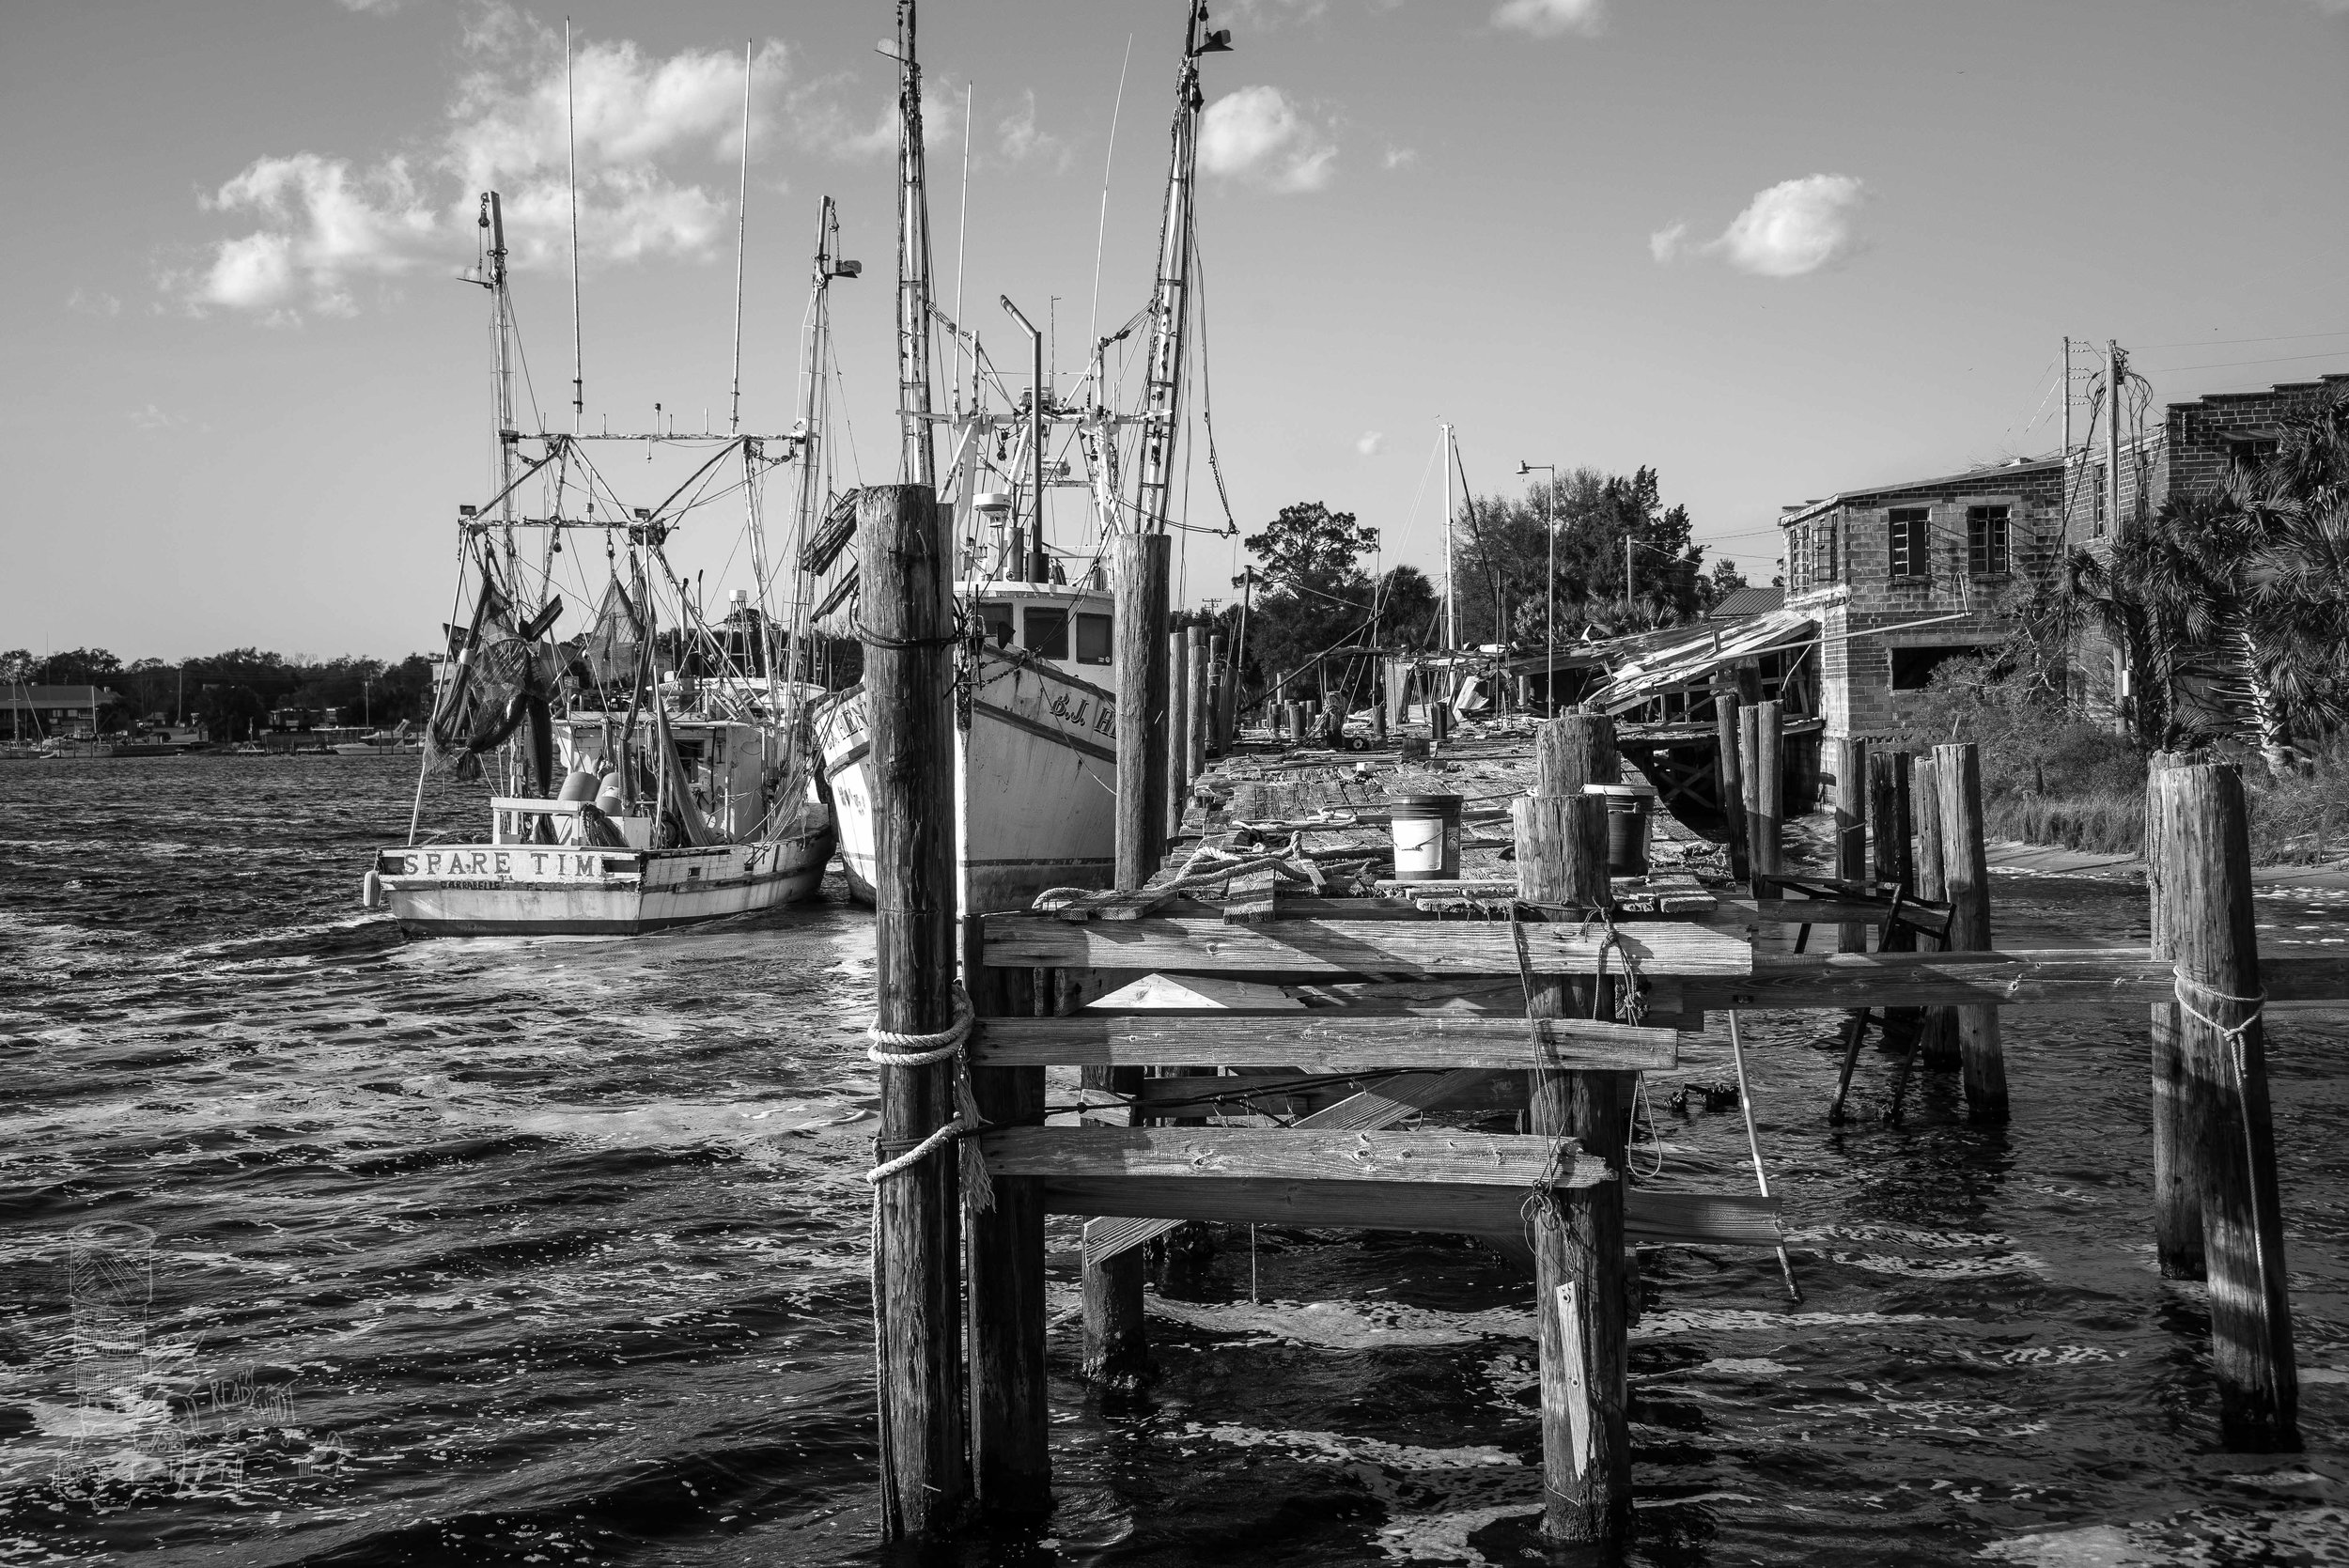 Shrimp Docks of Carrabelle